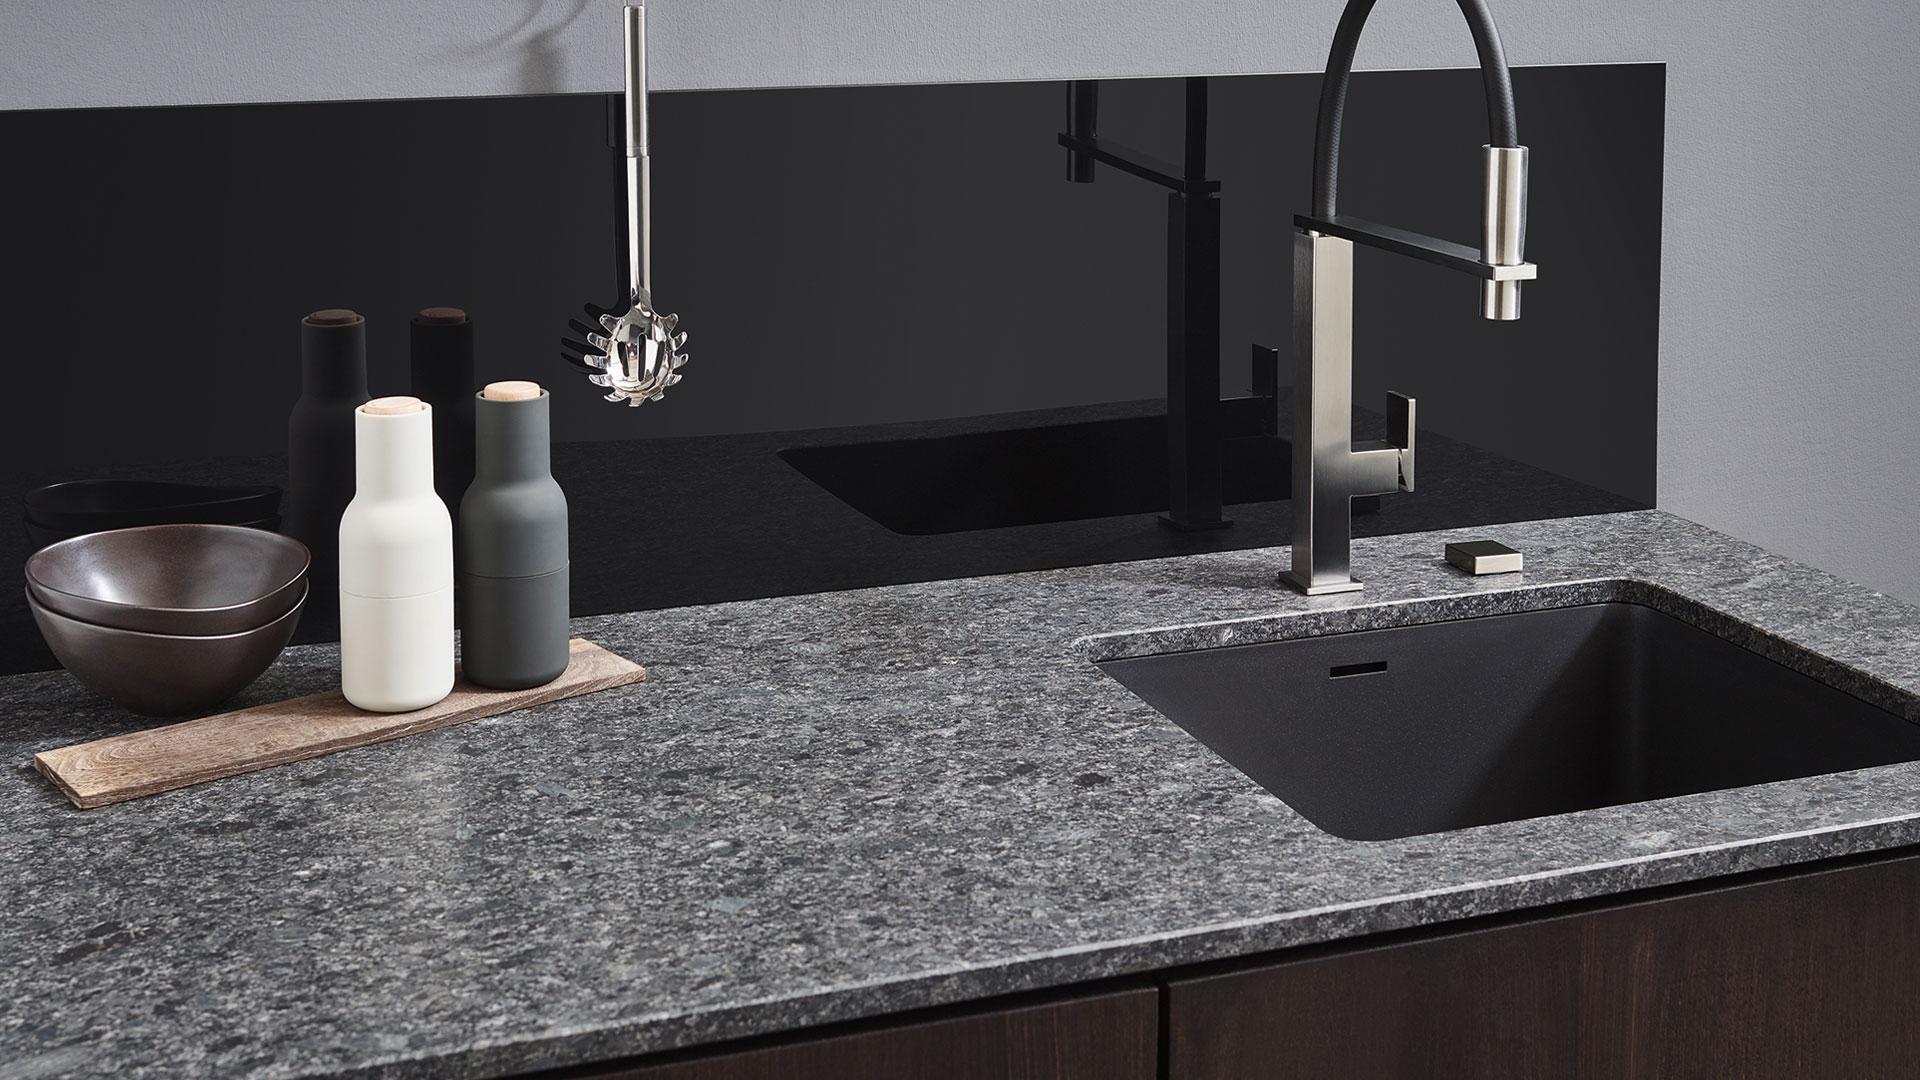 arbeitsplatten butter k chenstudio dresden. Black Bedroom Furniture Sets. Home Design Ideas